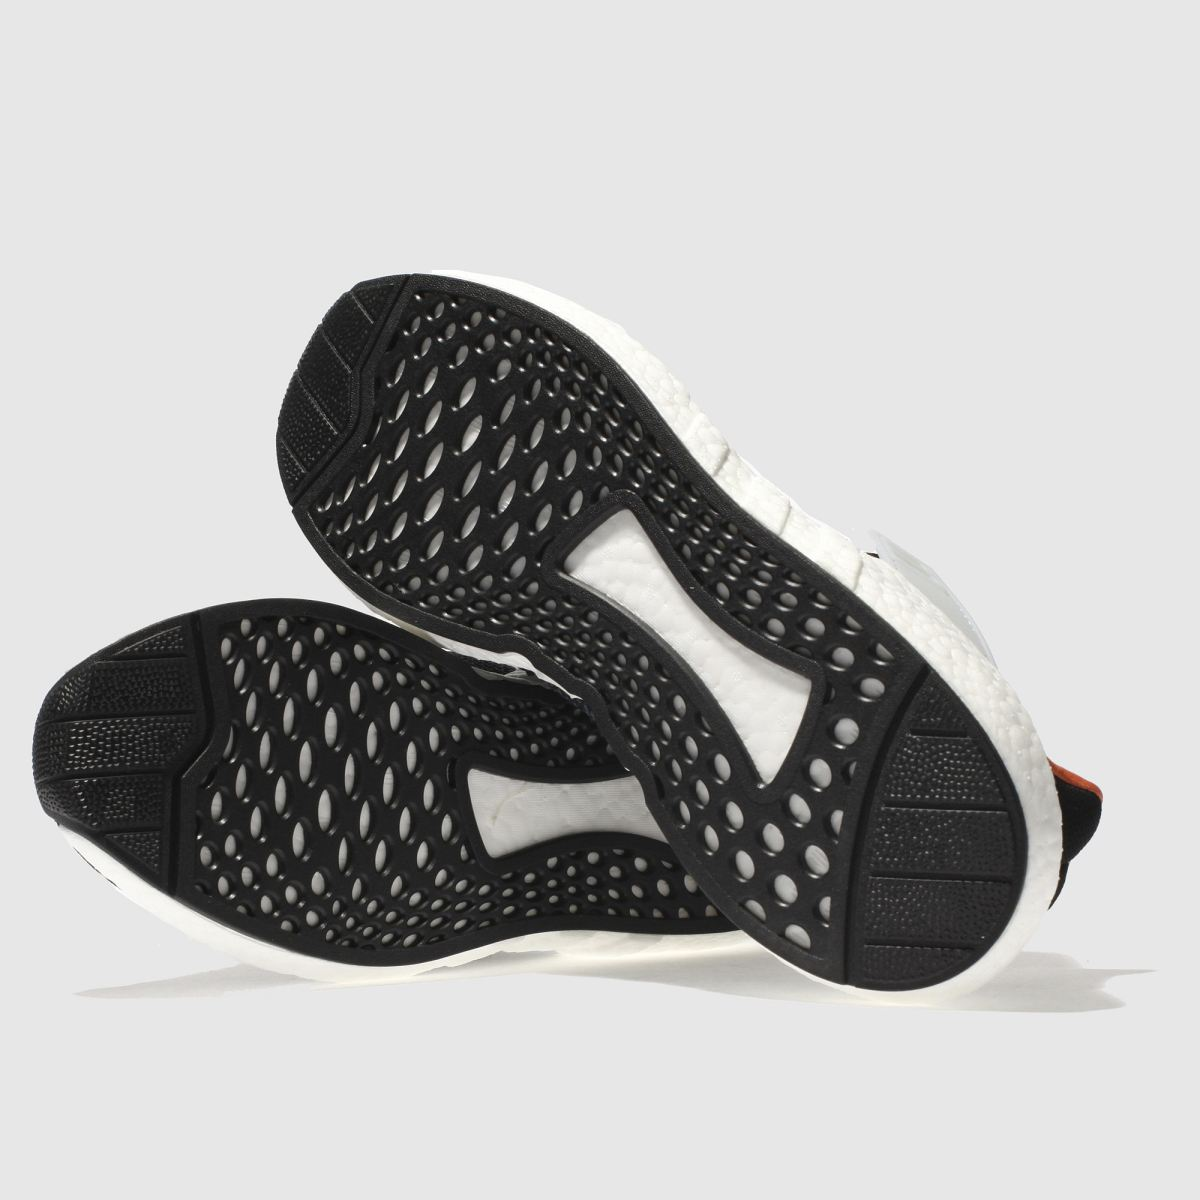 Herren Schwarz adidas Eqt Support 93/17 Sneaker Sneaker Sneaker   schuh Gute Qualität beliebte Schuhe 791778